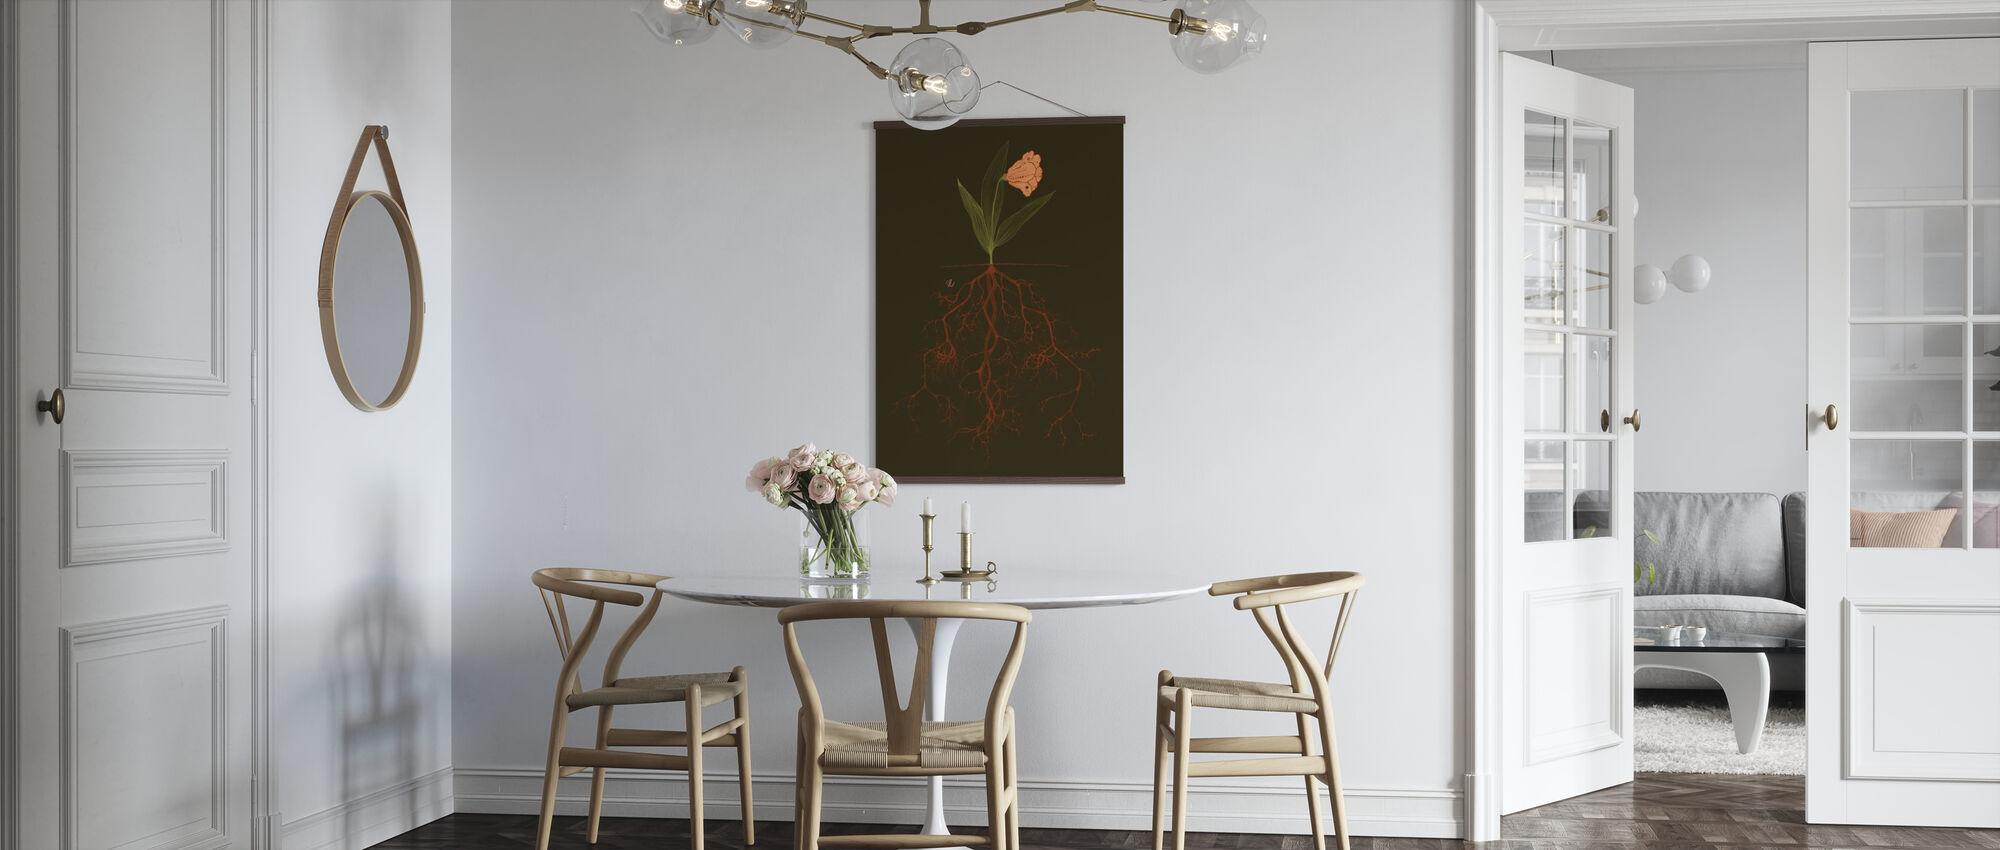 Something Fragile - Poster - Kitchen